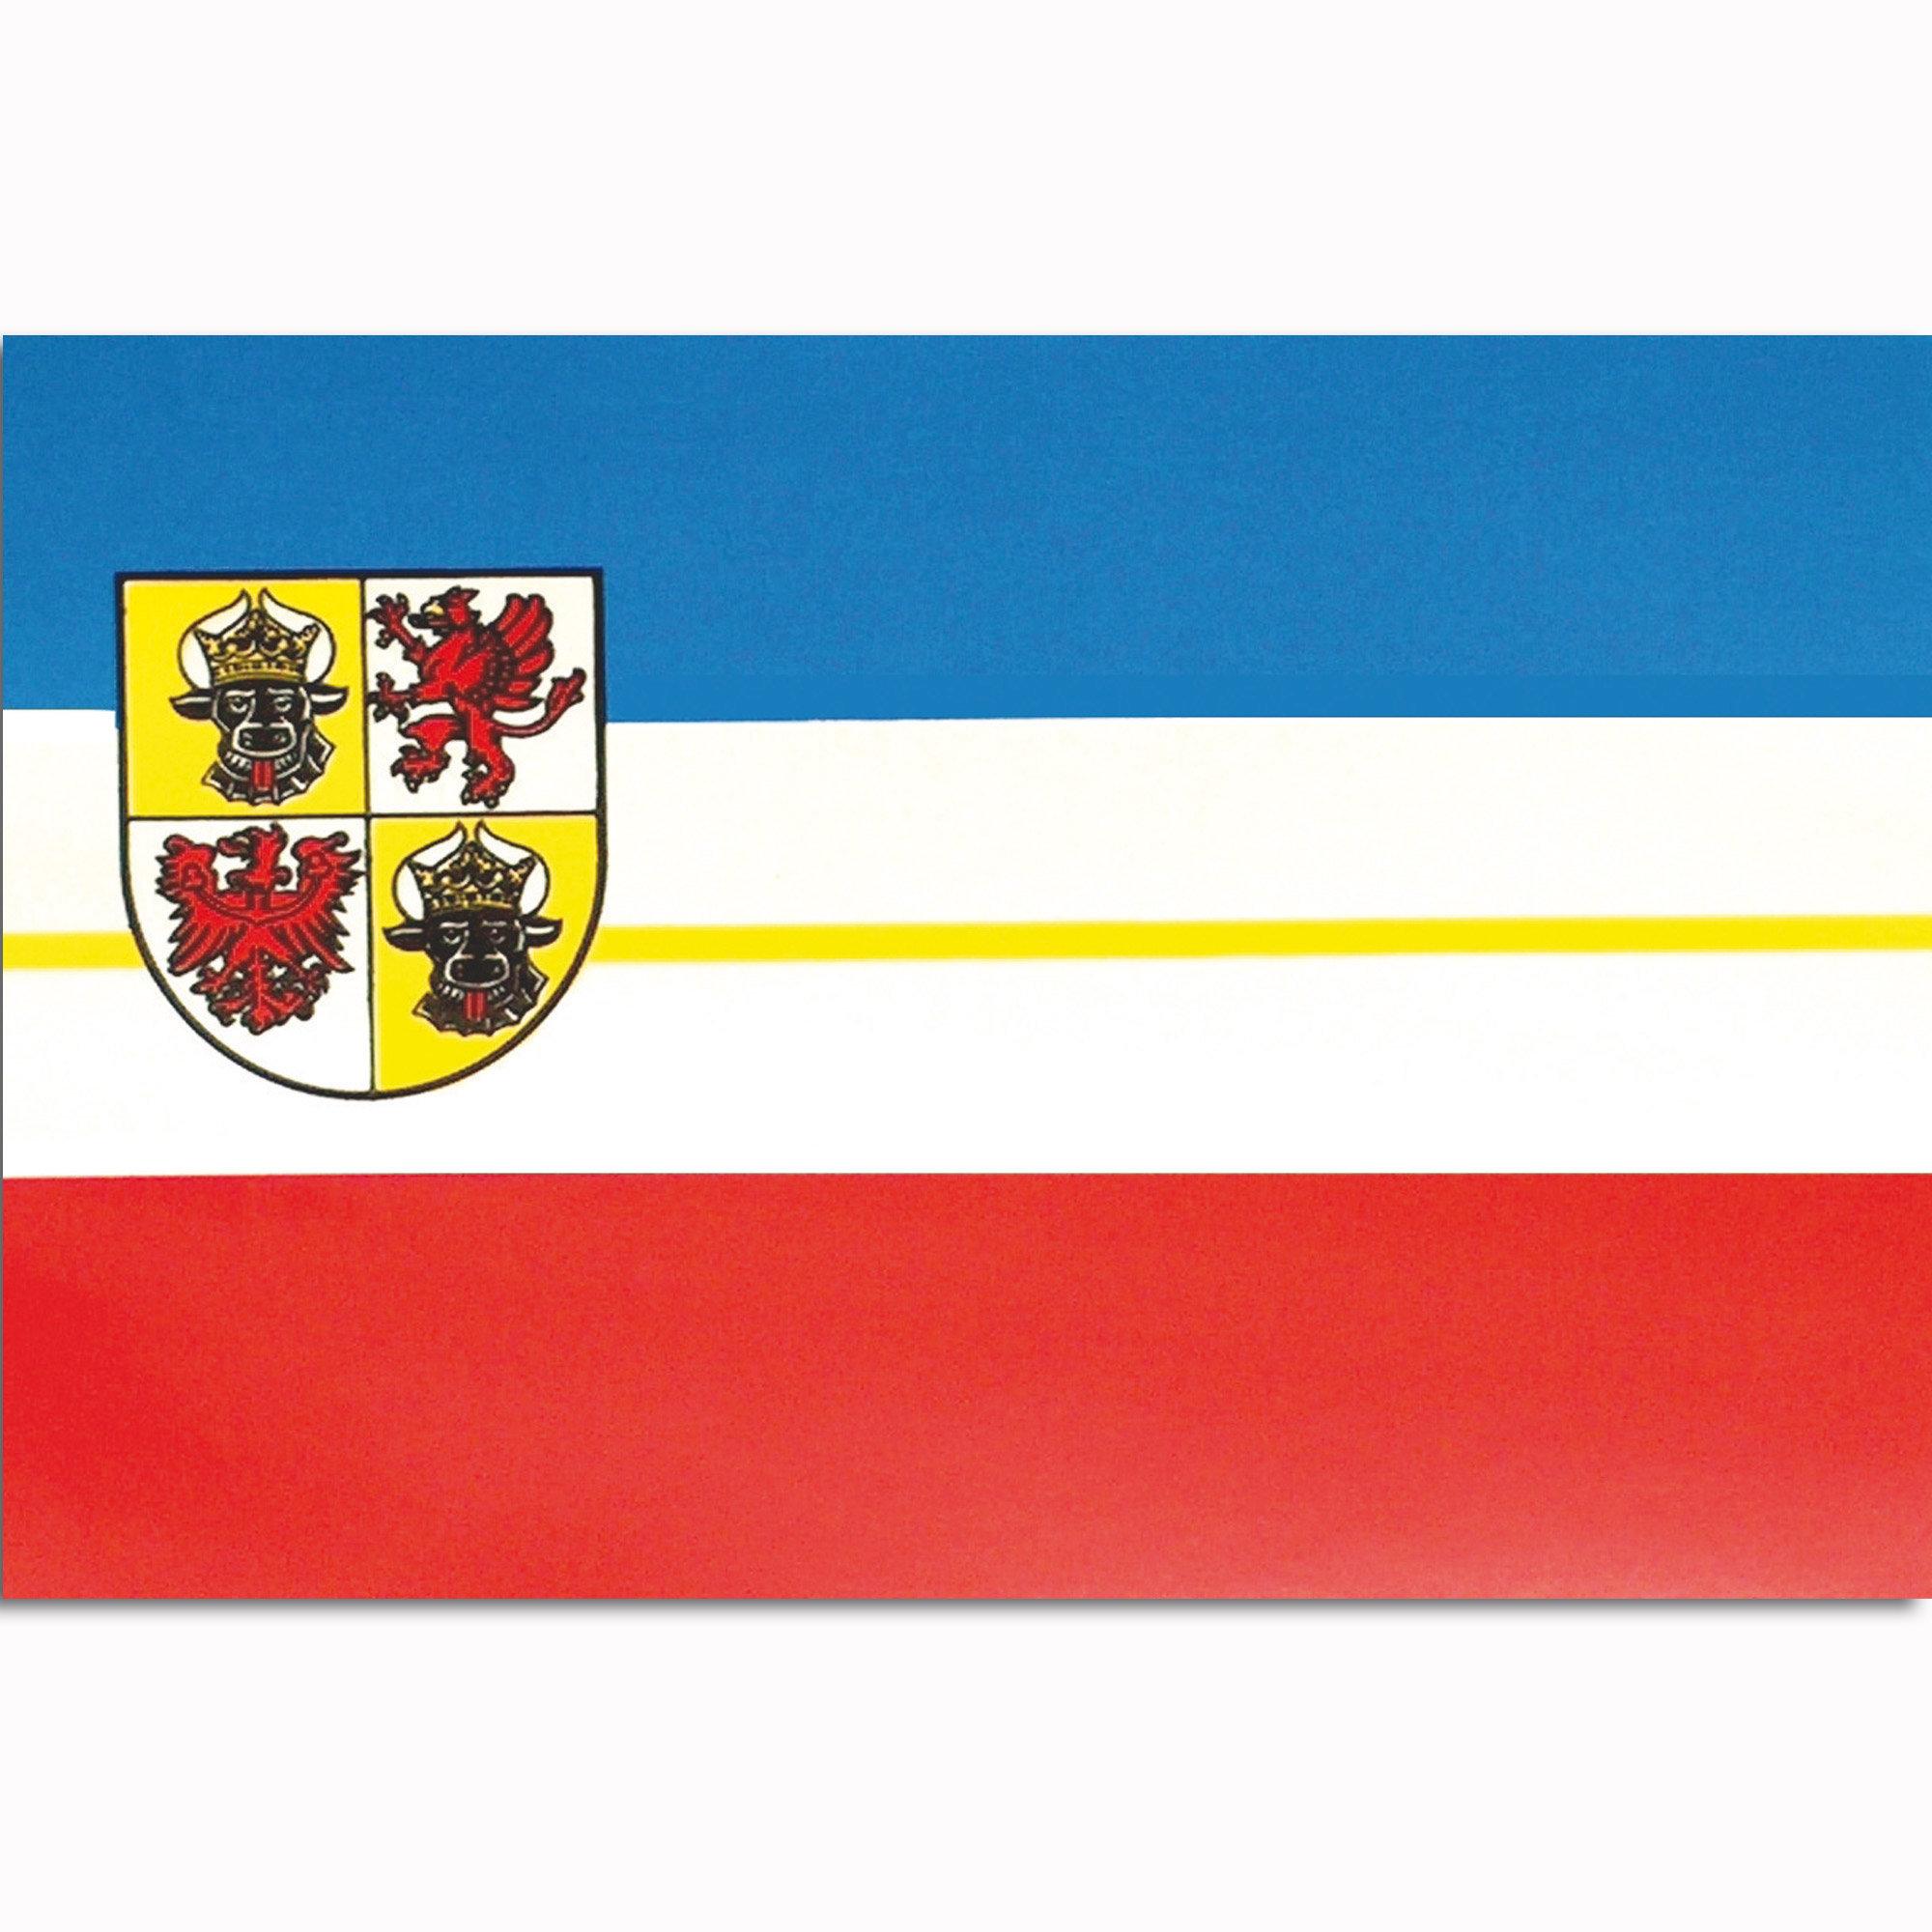 Aufkleber Mecklenburg-Vorpommern